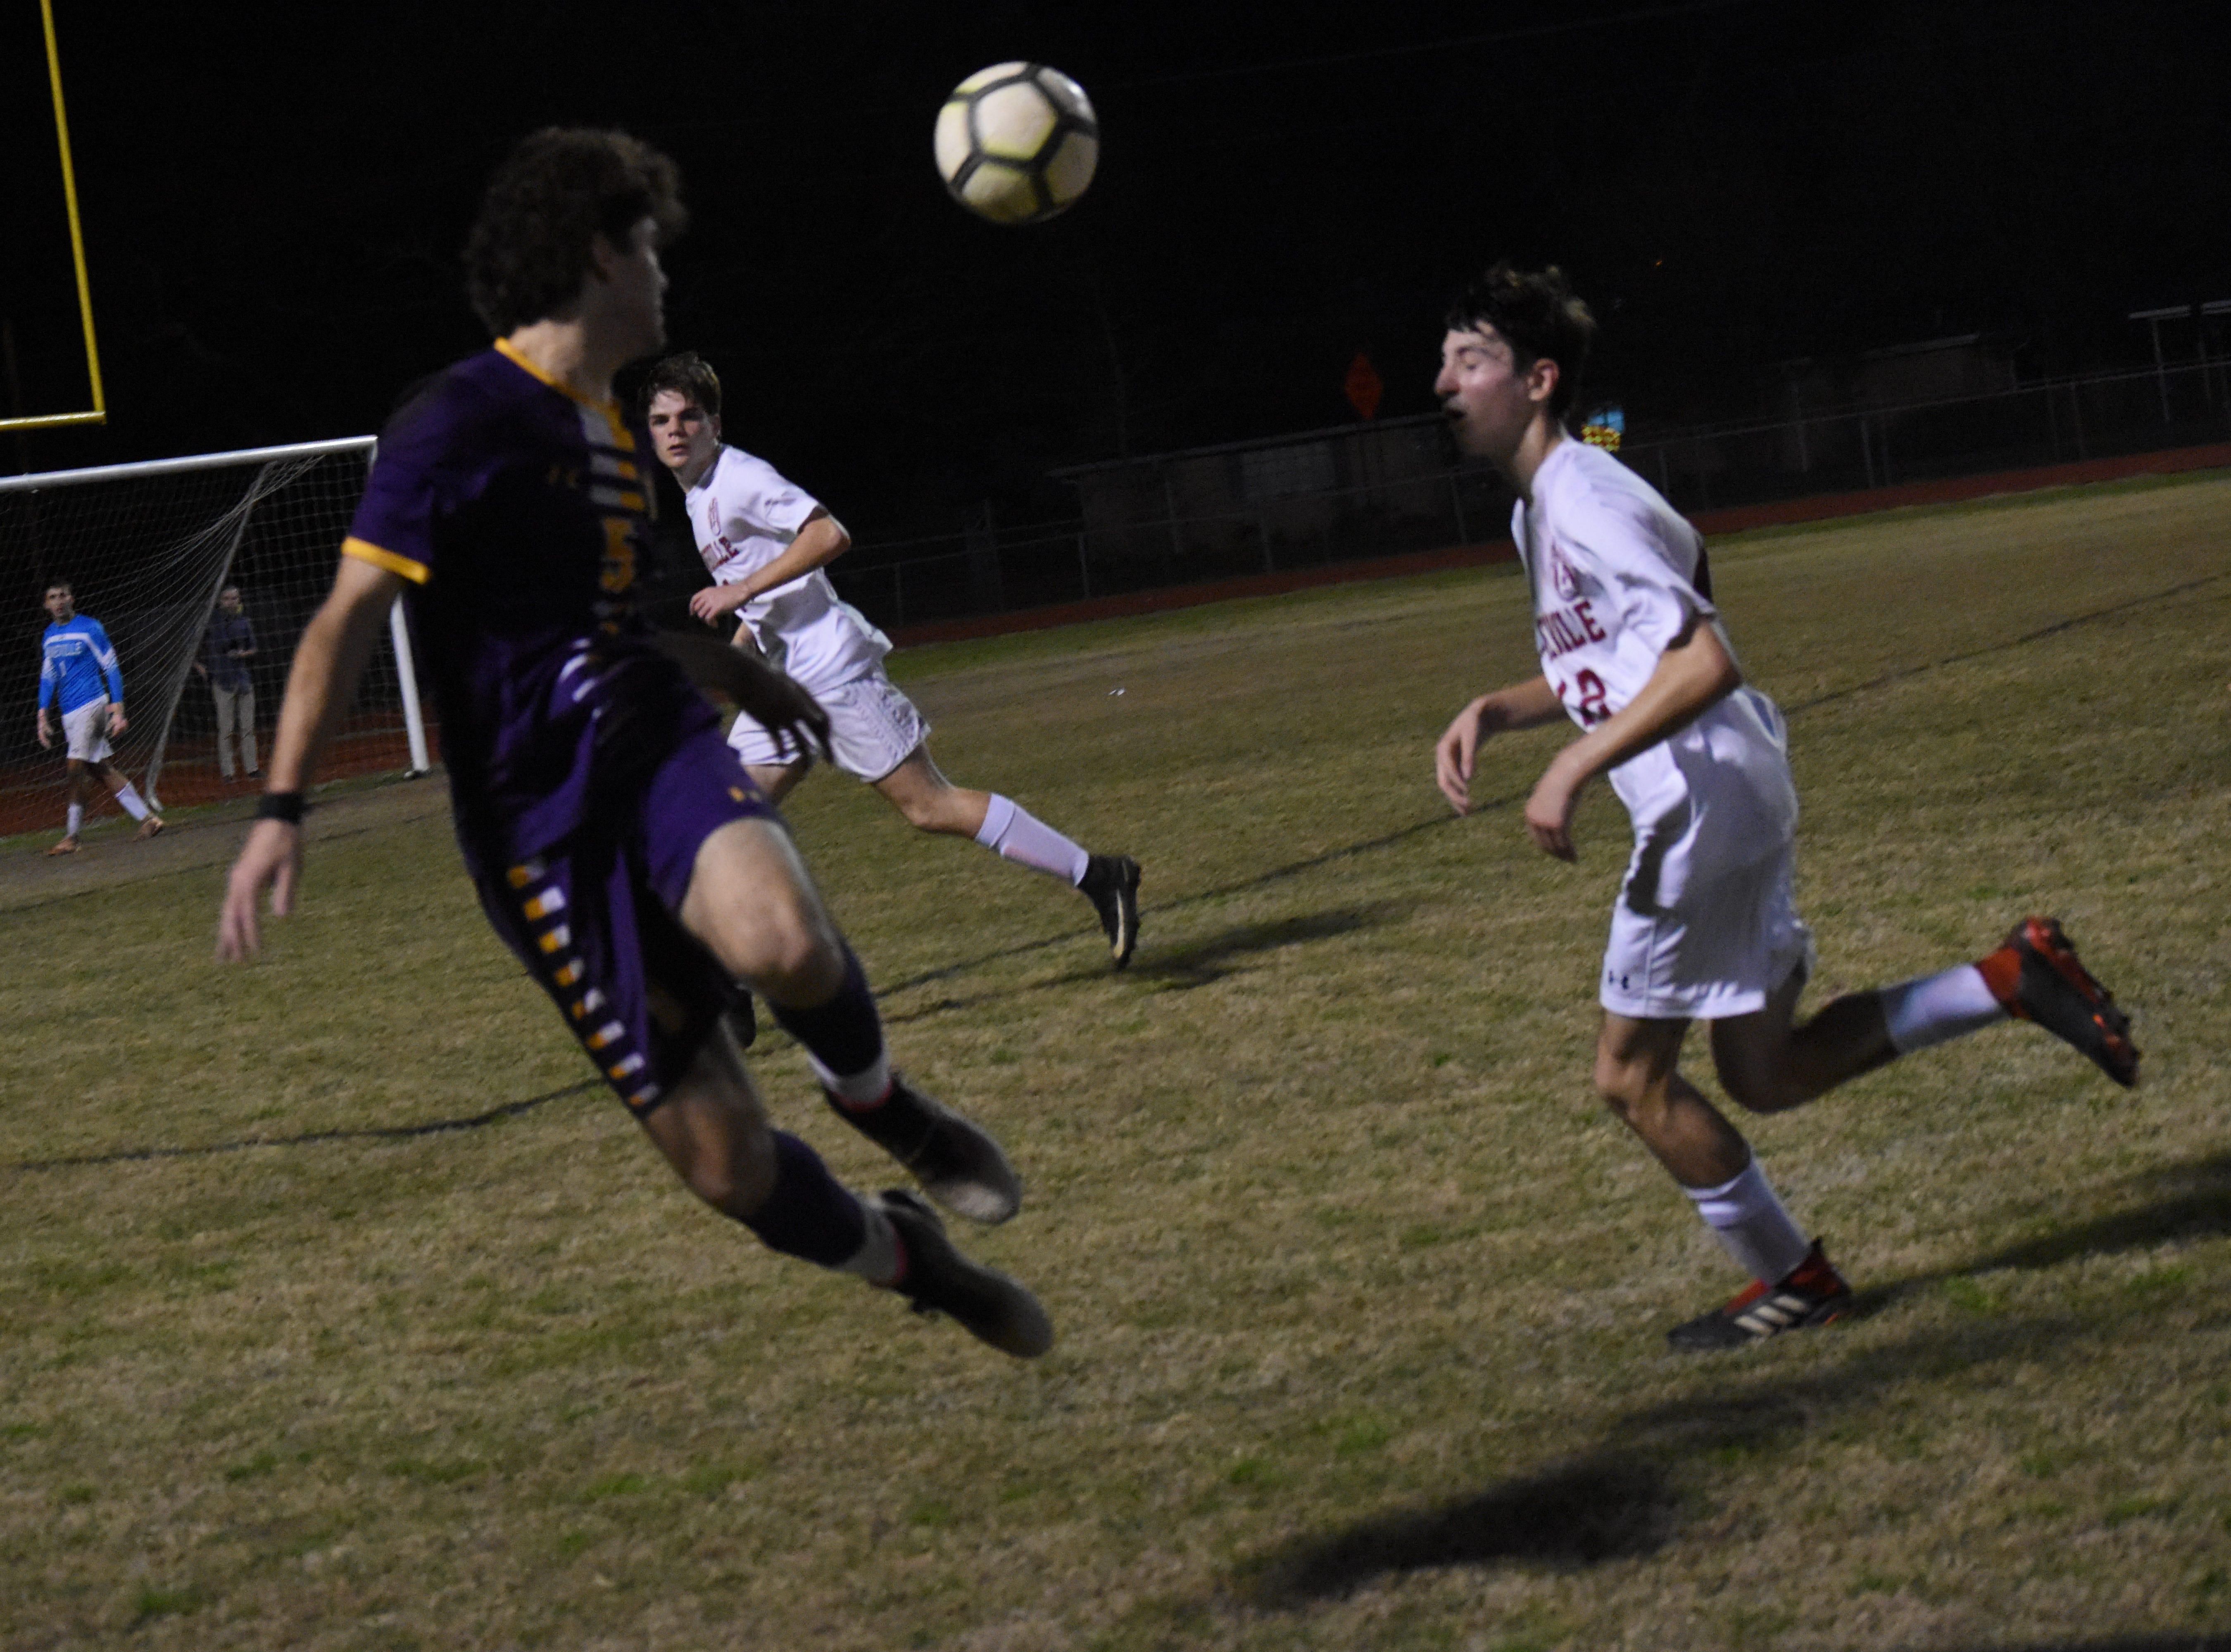 Alexandria Senior High School boys soccer hosted Pineville High School in the Division I regionals held Wednesday, Feb. 6, 2019. ASH won 4-3.